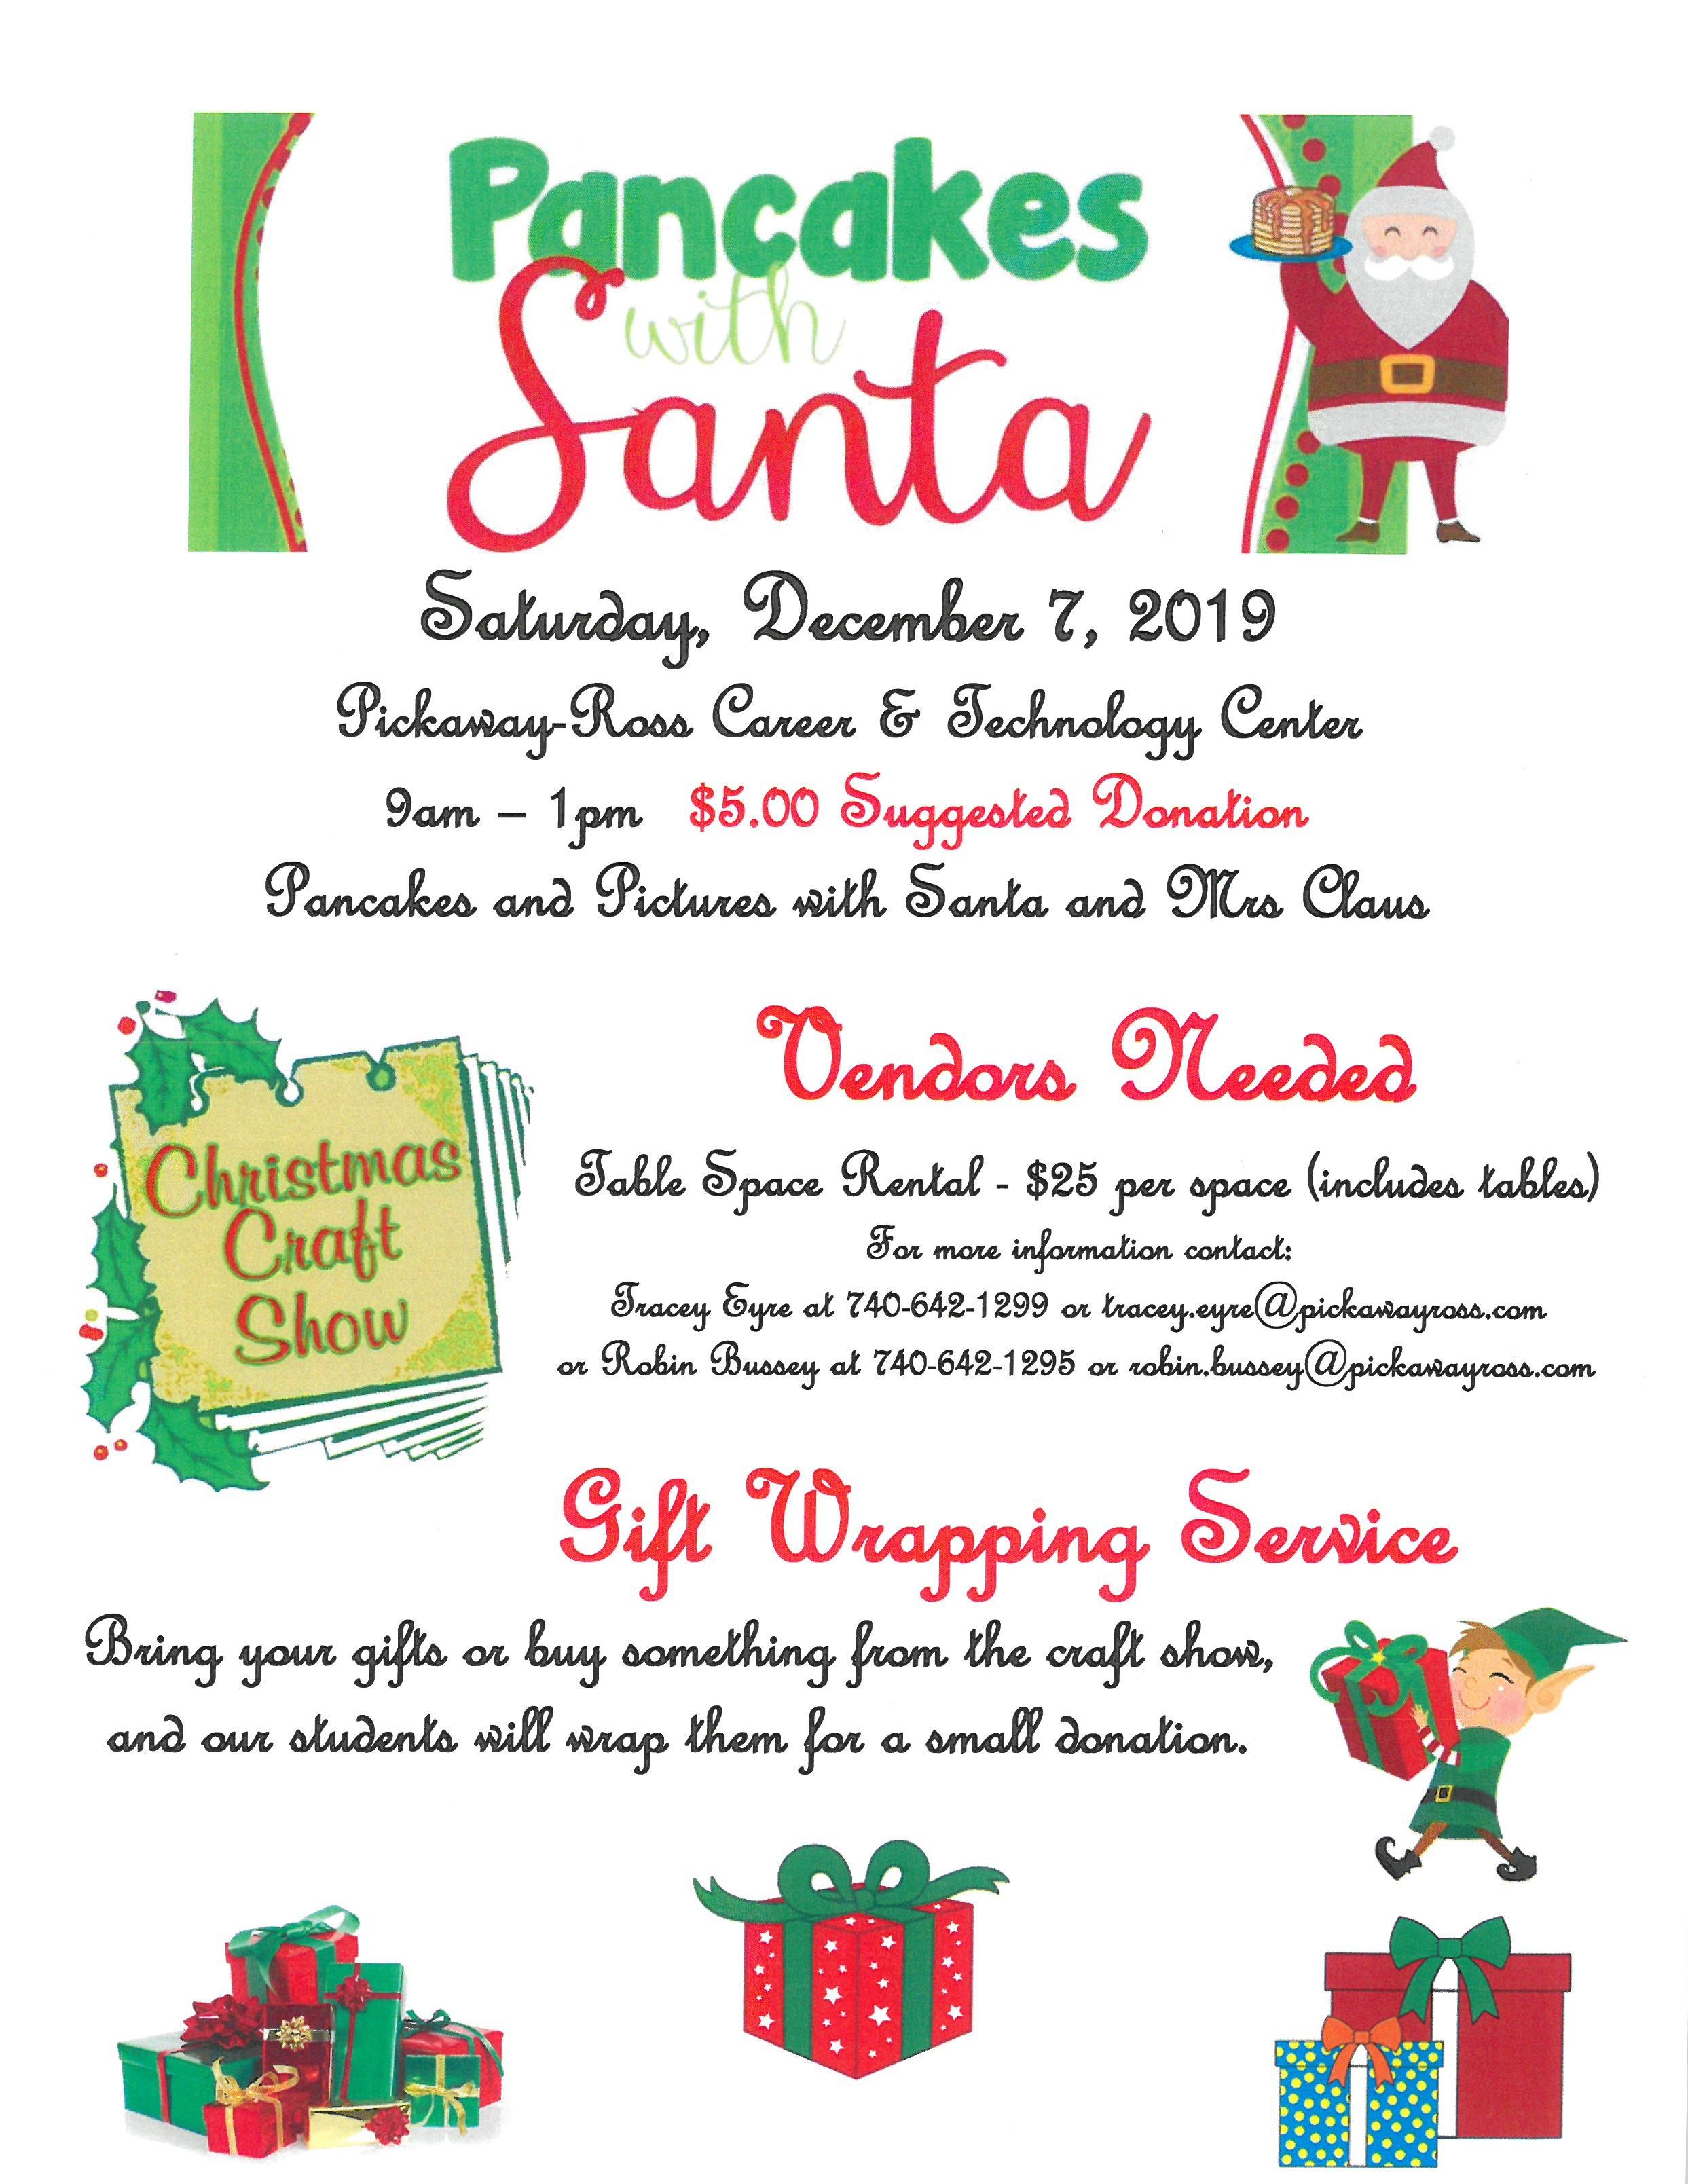 Pancakes with santa & craft show